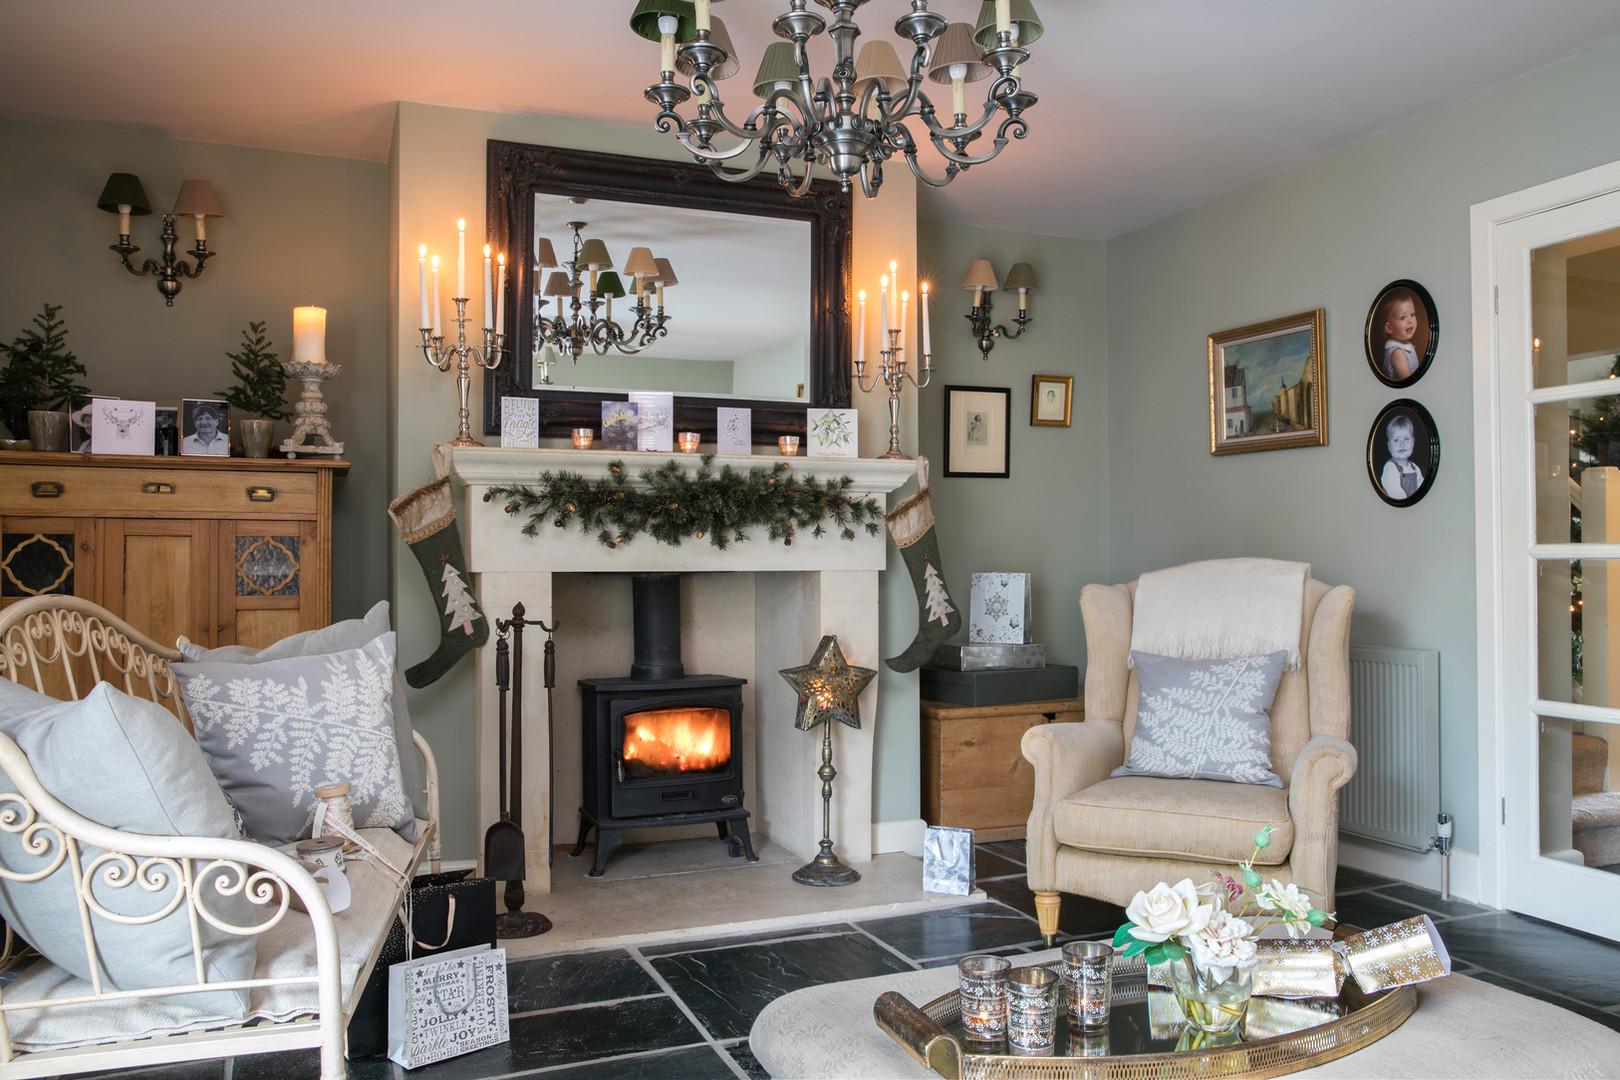 lounge interior design at Christmas.jpg